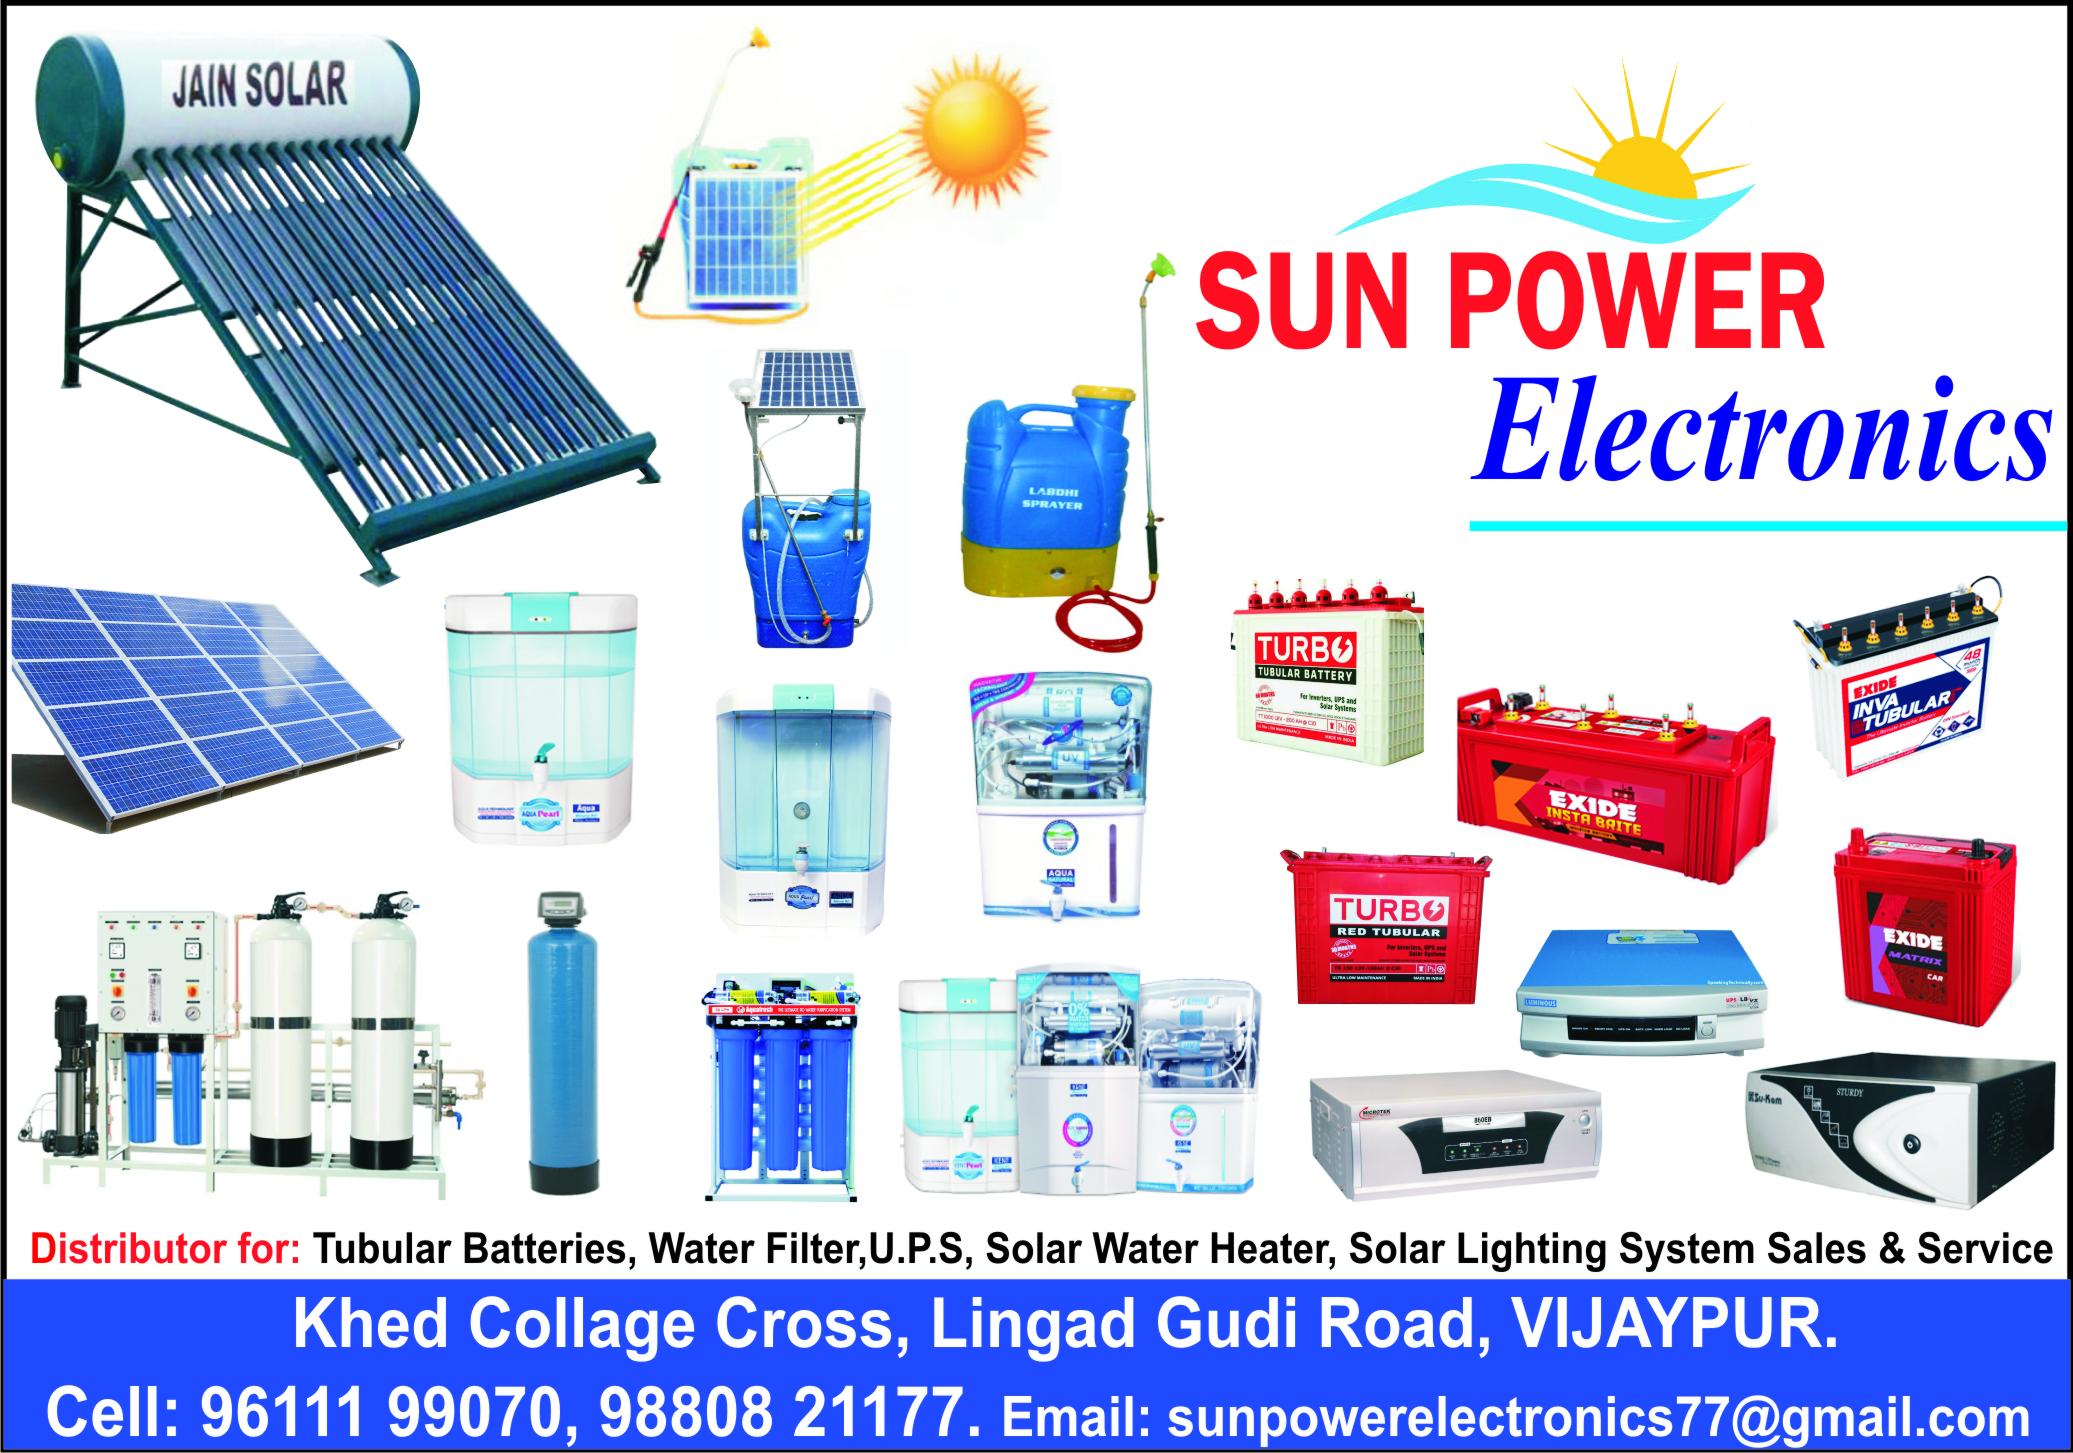 SUN POWER Electronics